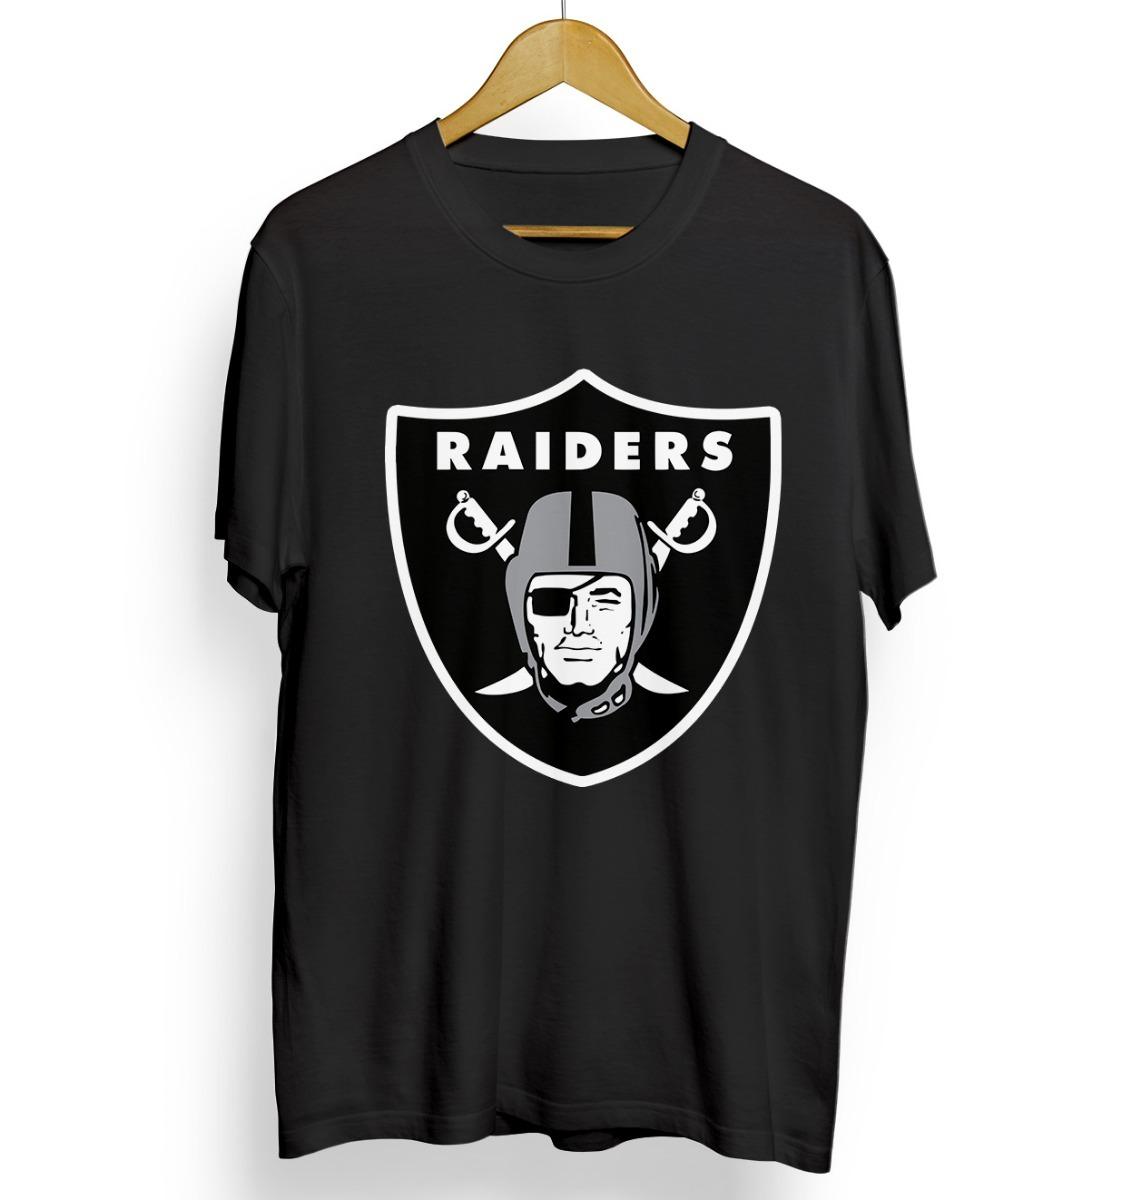 97904f9bf camiseta masculina oakland raiders camisa futebol americano. Carregando  zoom.